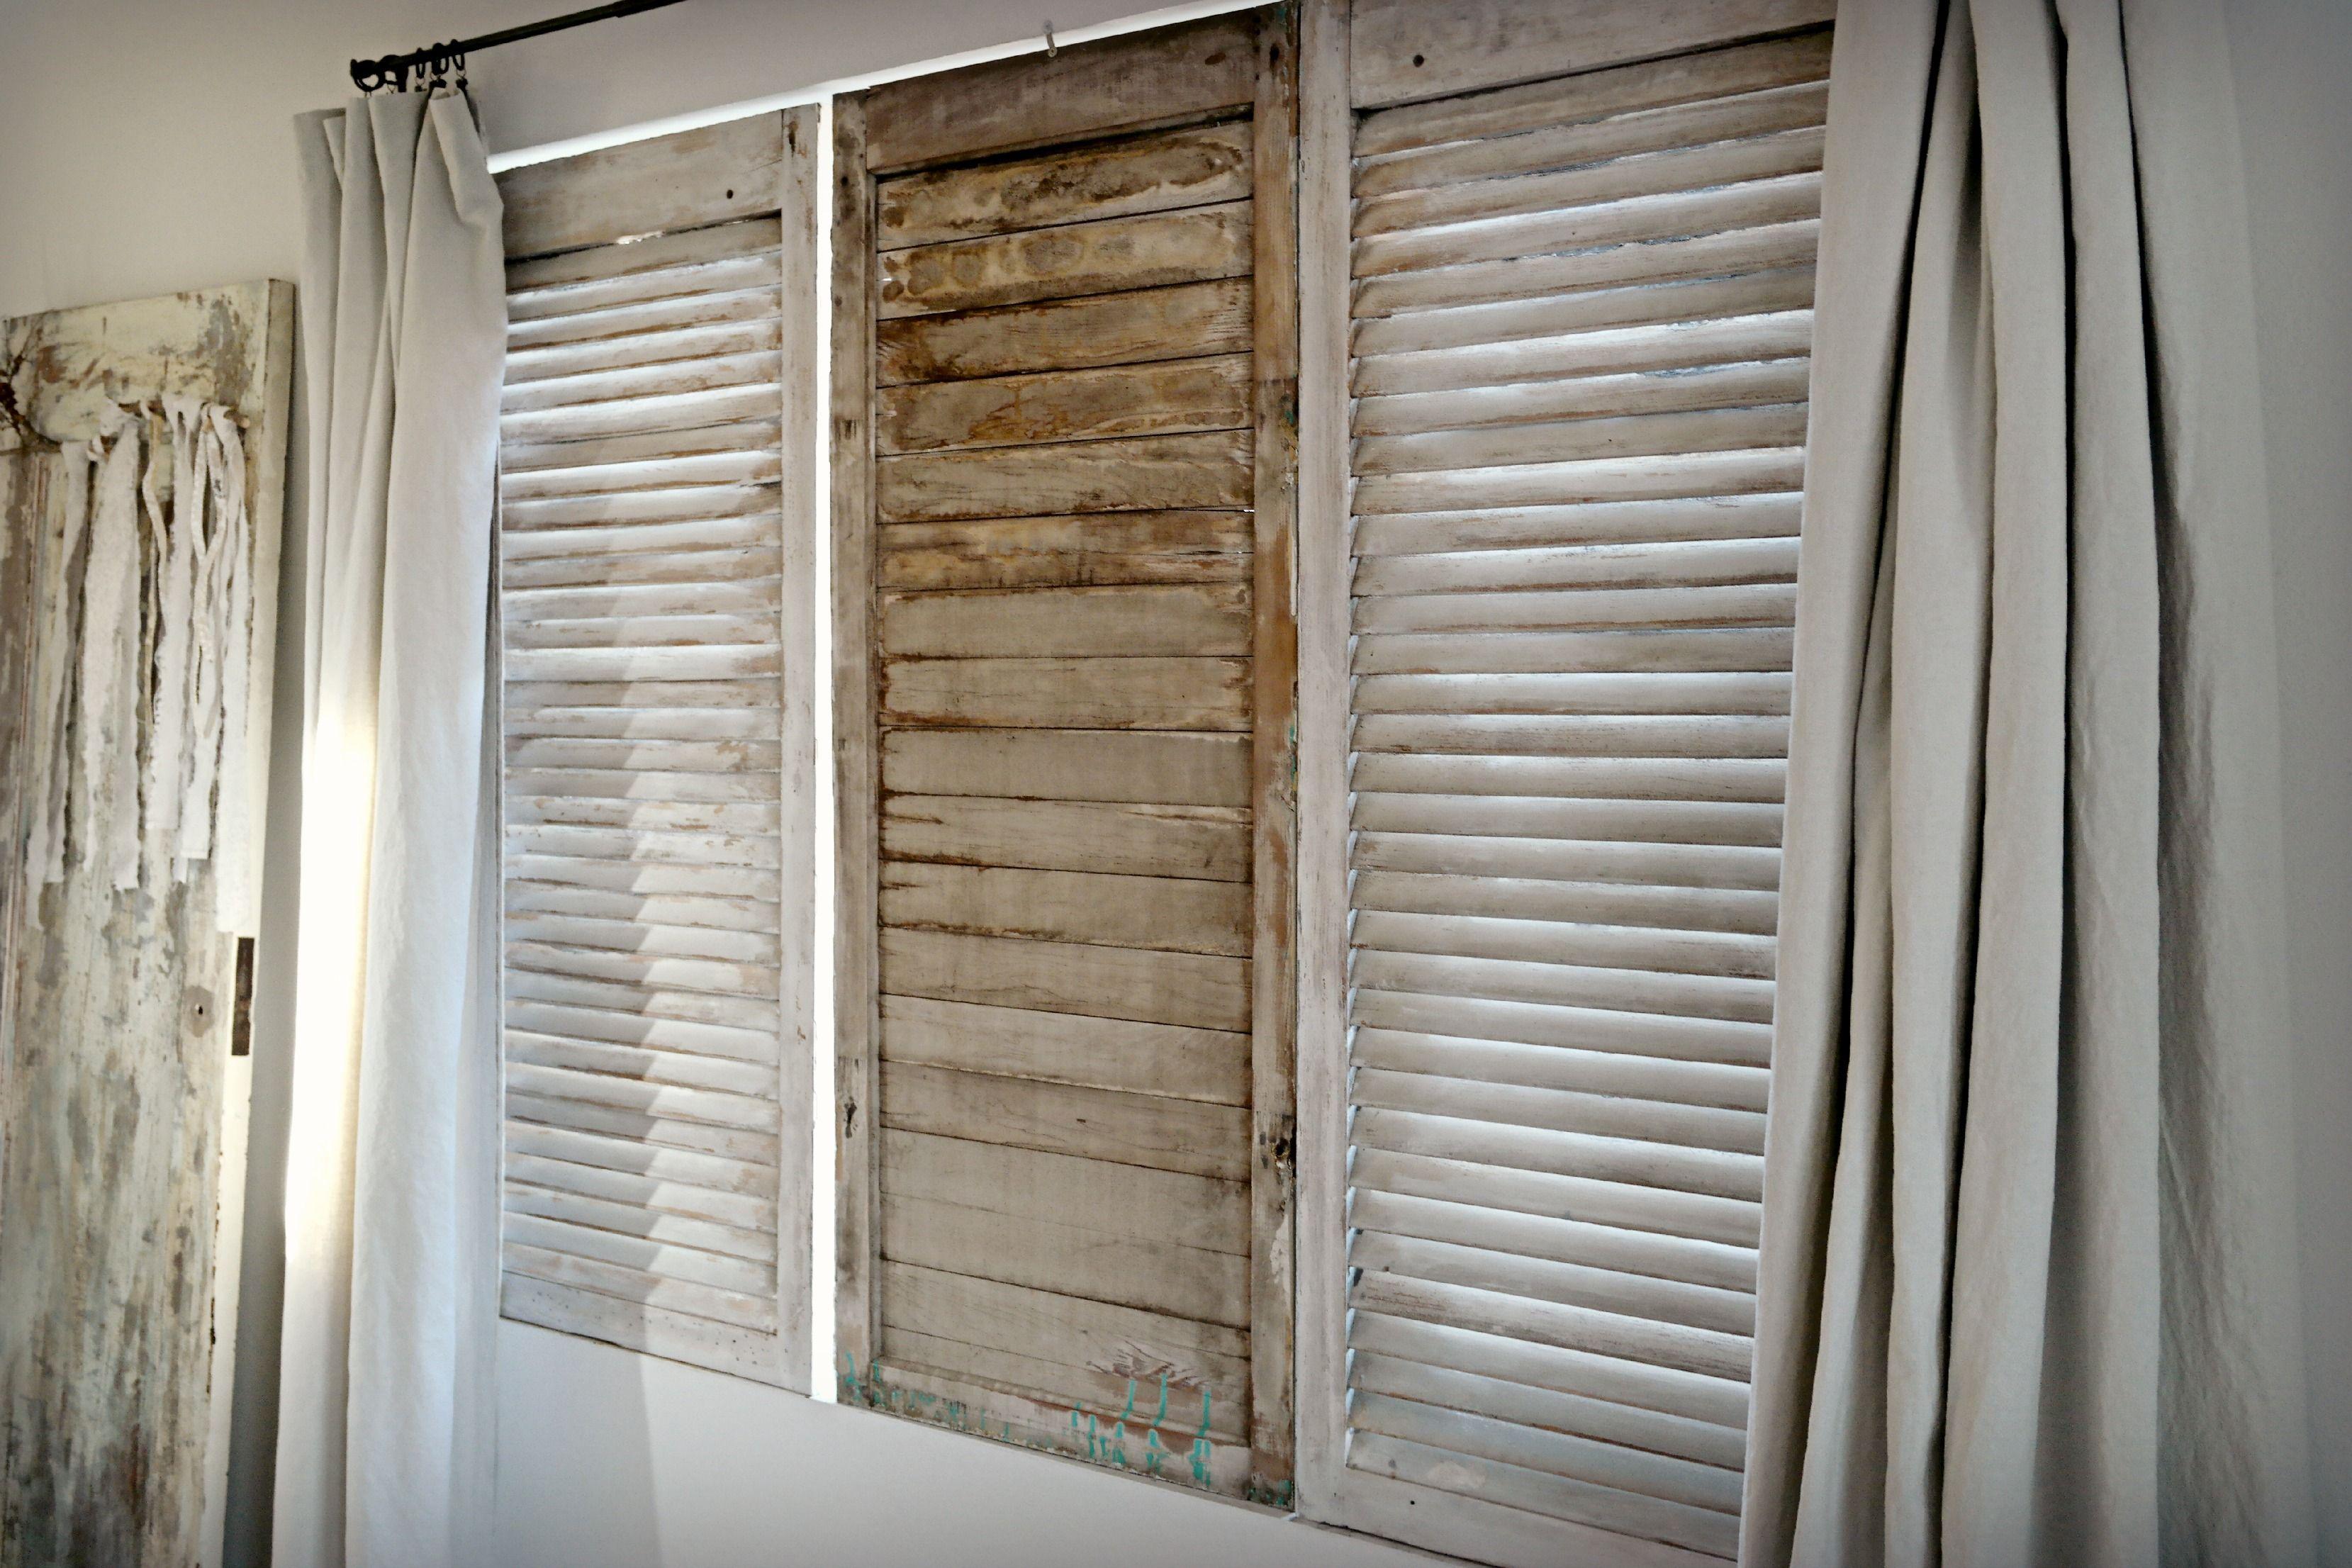 hinges hinge tilt plantation norman and shutter hidden shutters interior